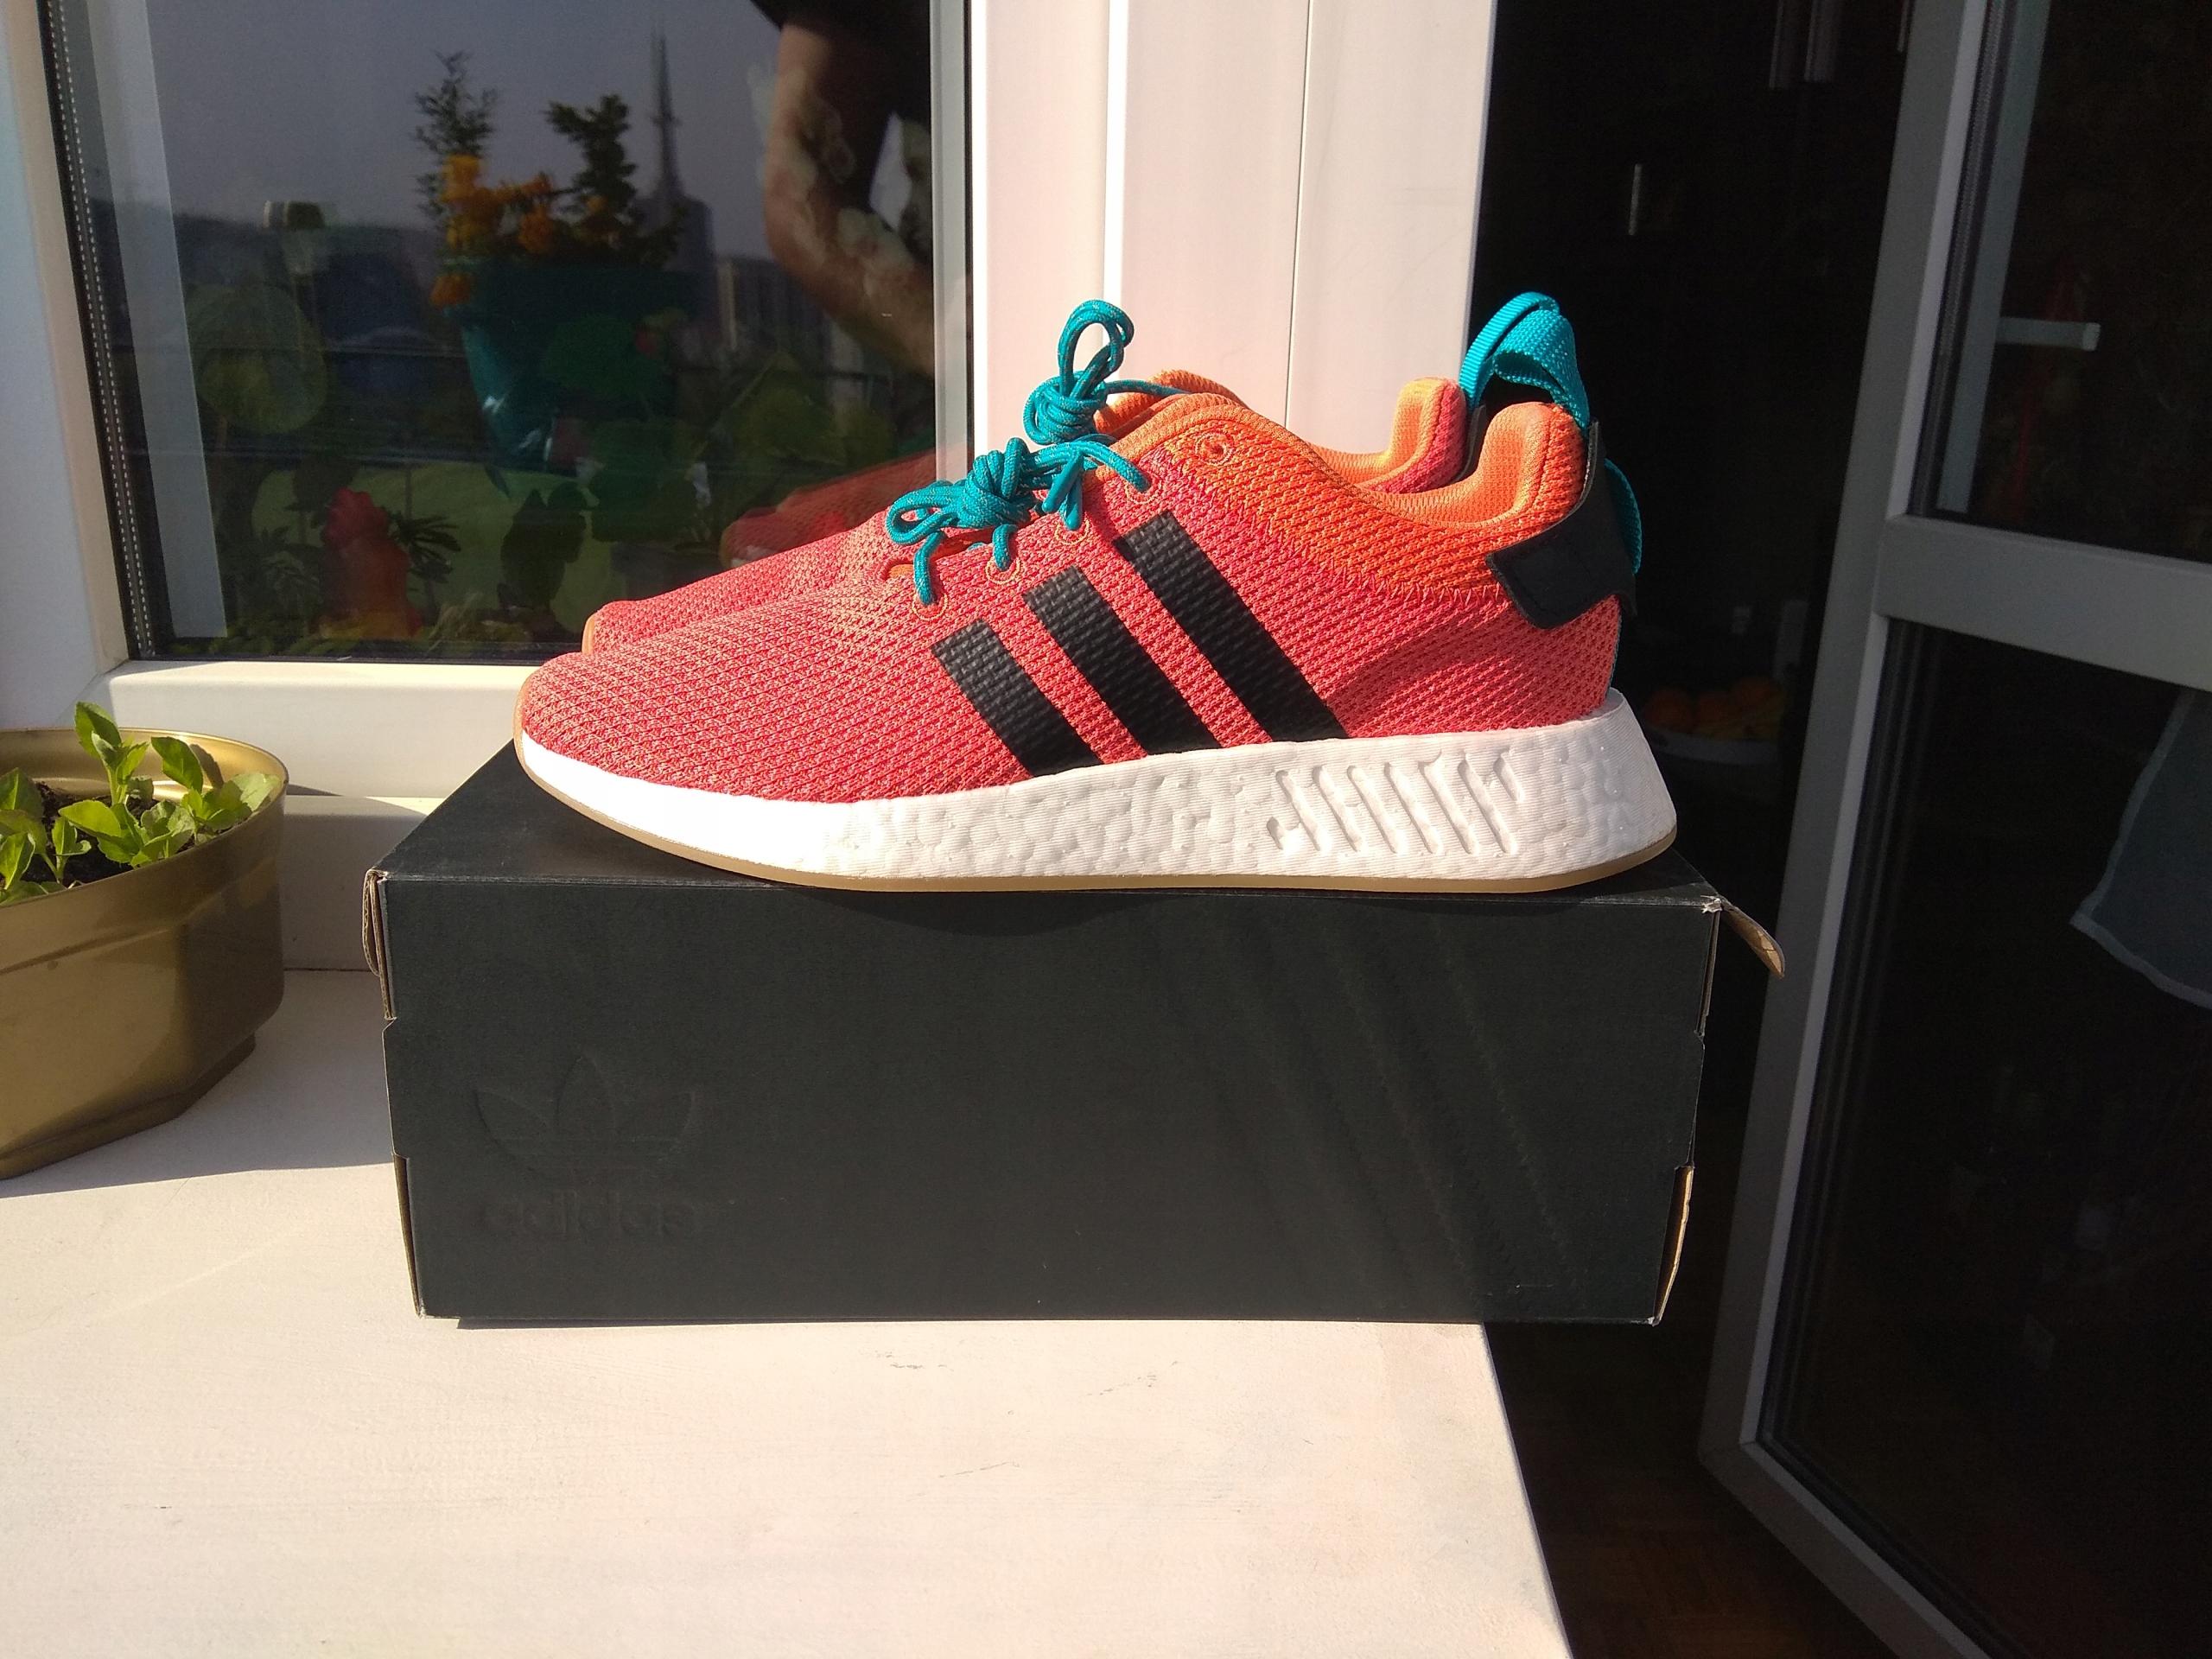 Adidas NMD R2 boost orange 10 us nike air max